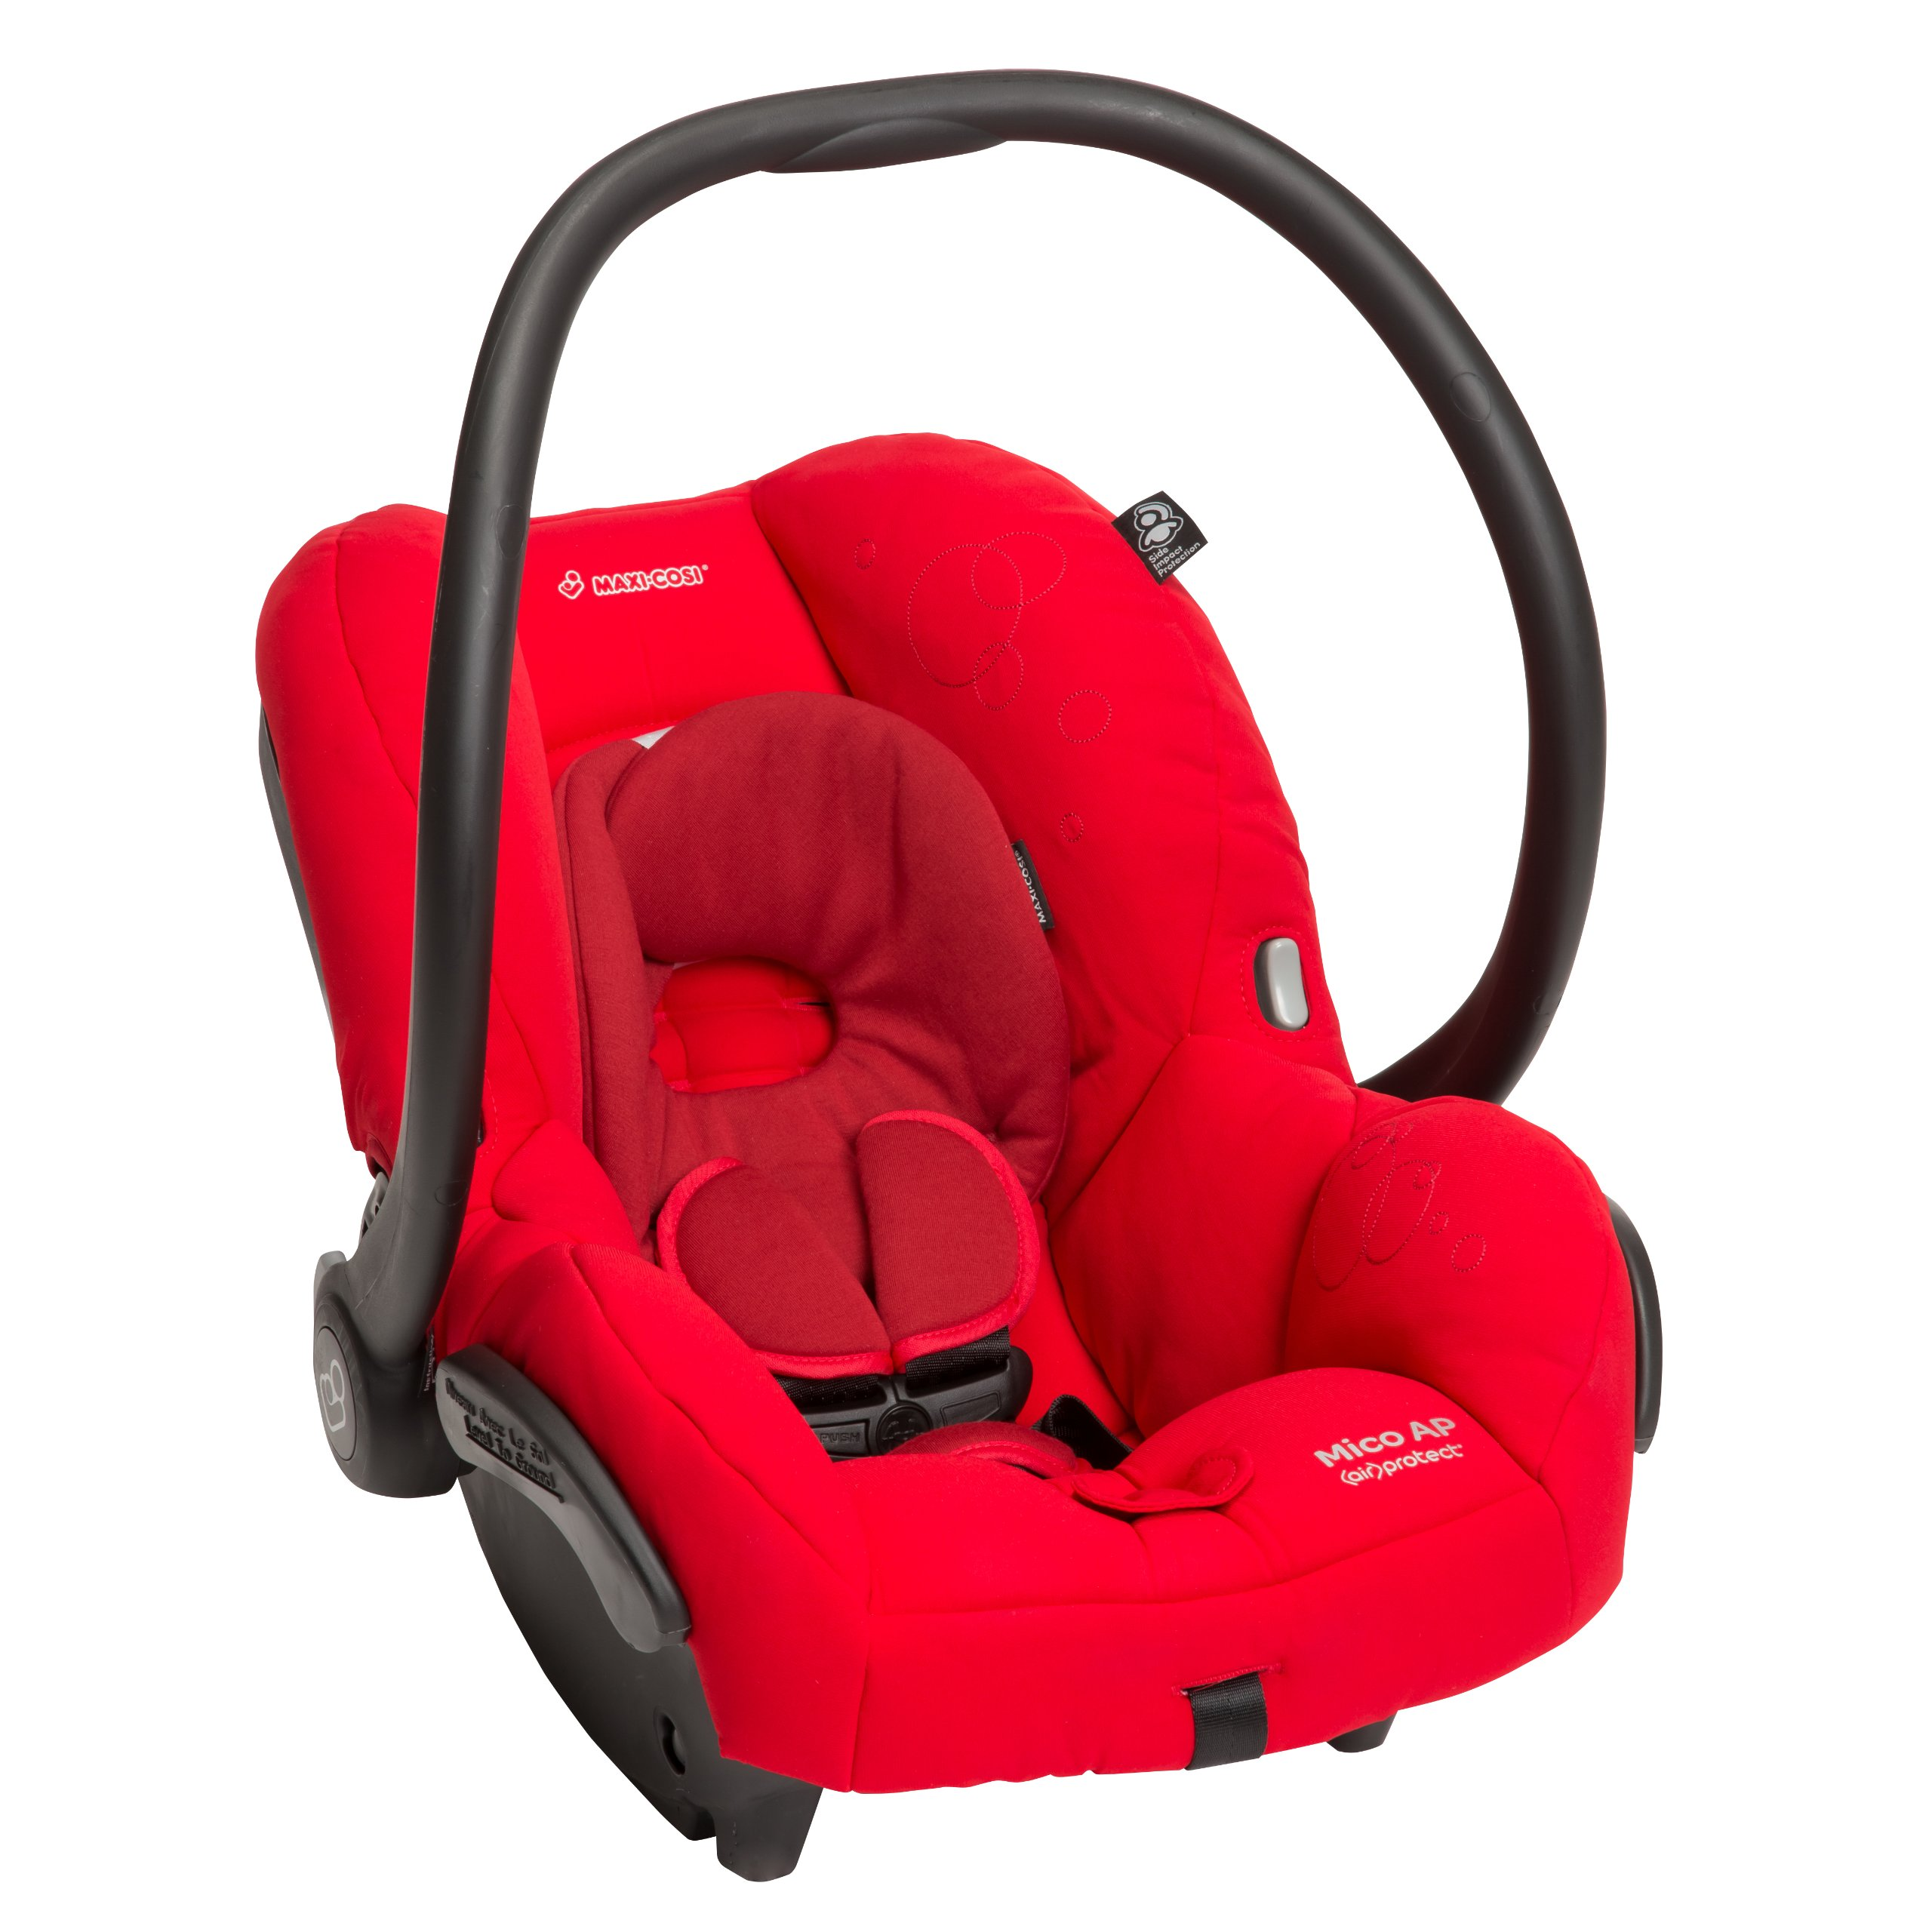 Maxi-Cosi Mico AP Infant Car Seat - Red by Maxi-Cosi (Image #2)